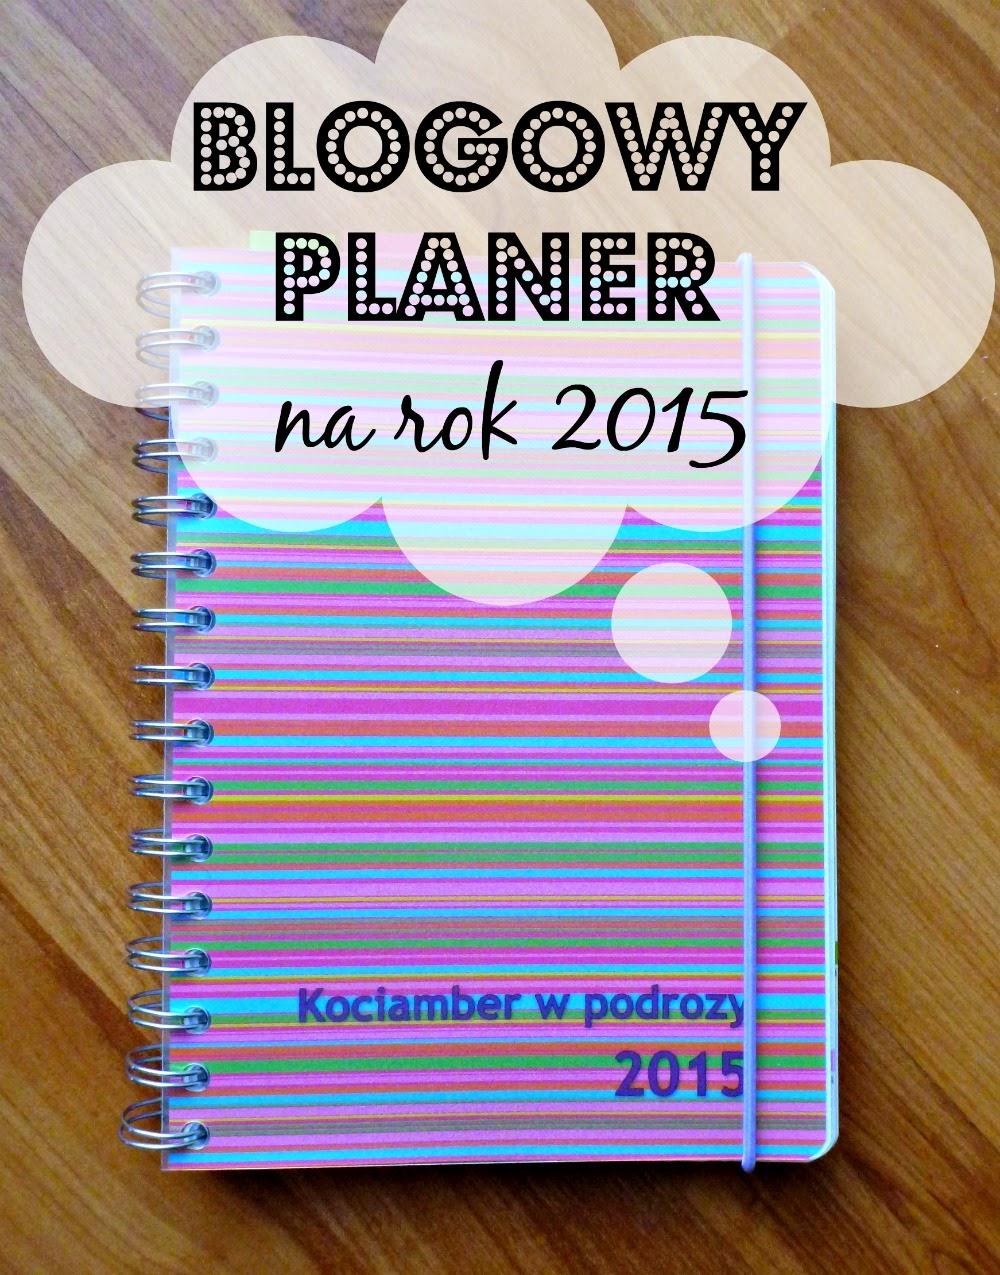 Blogowy planer - kalendarz 2015